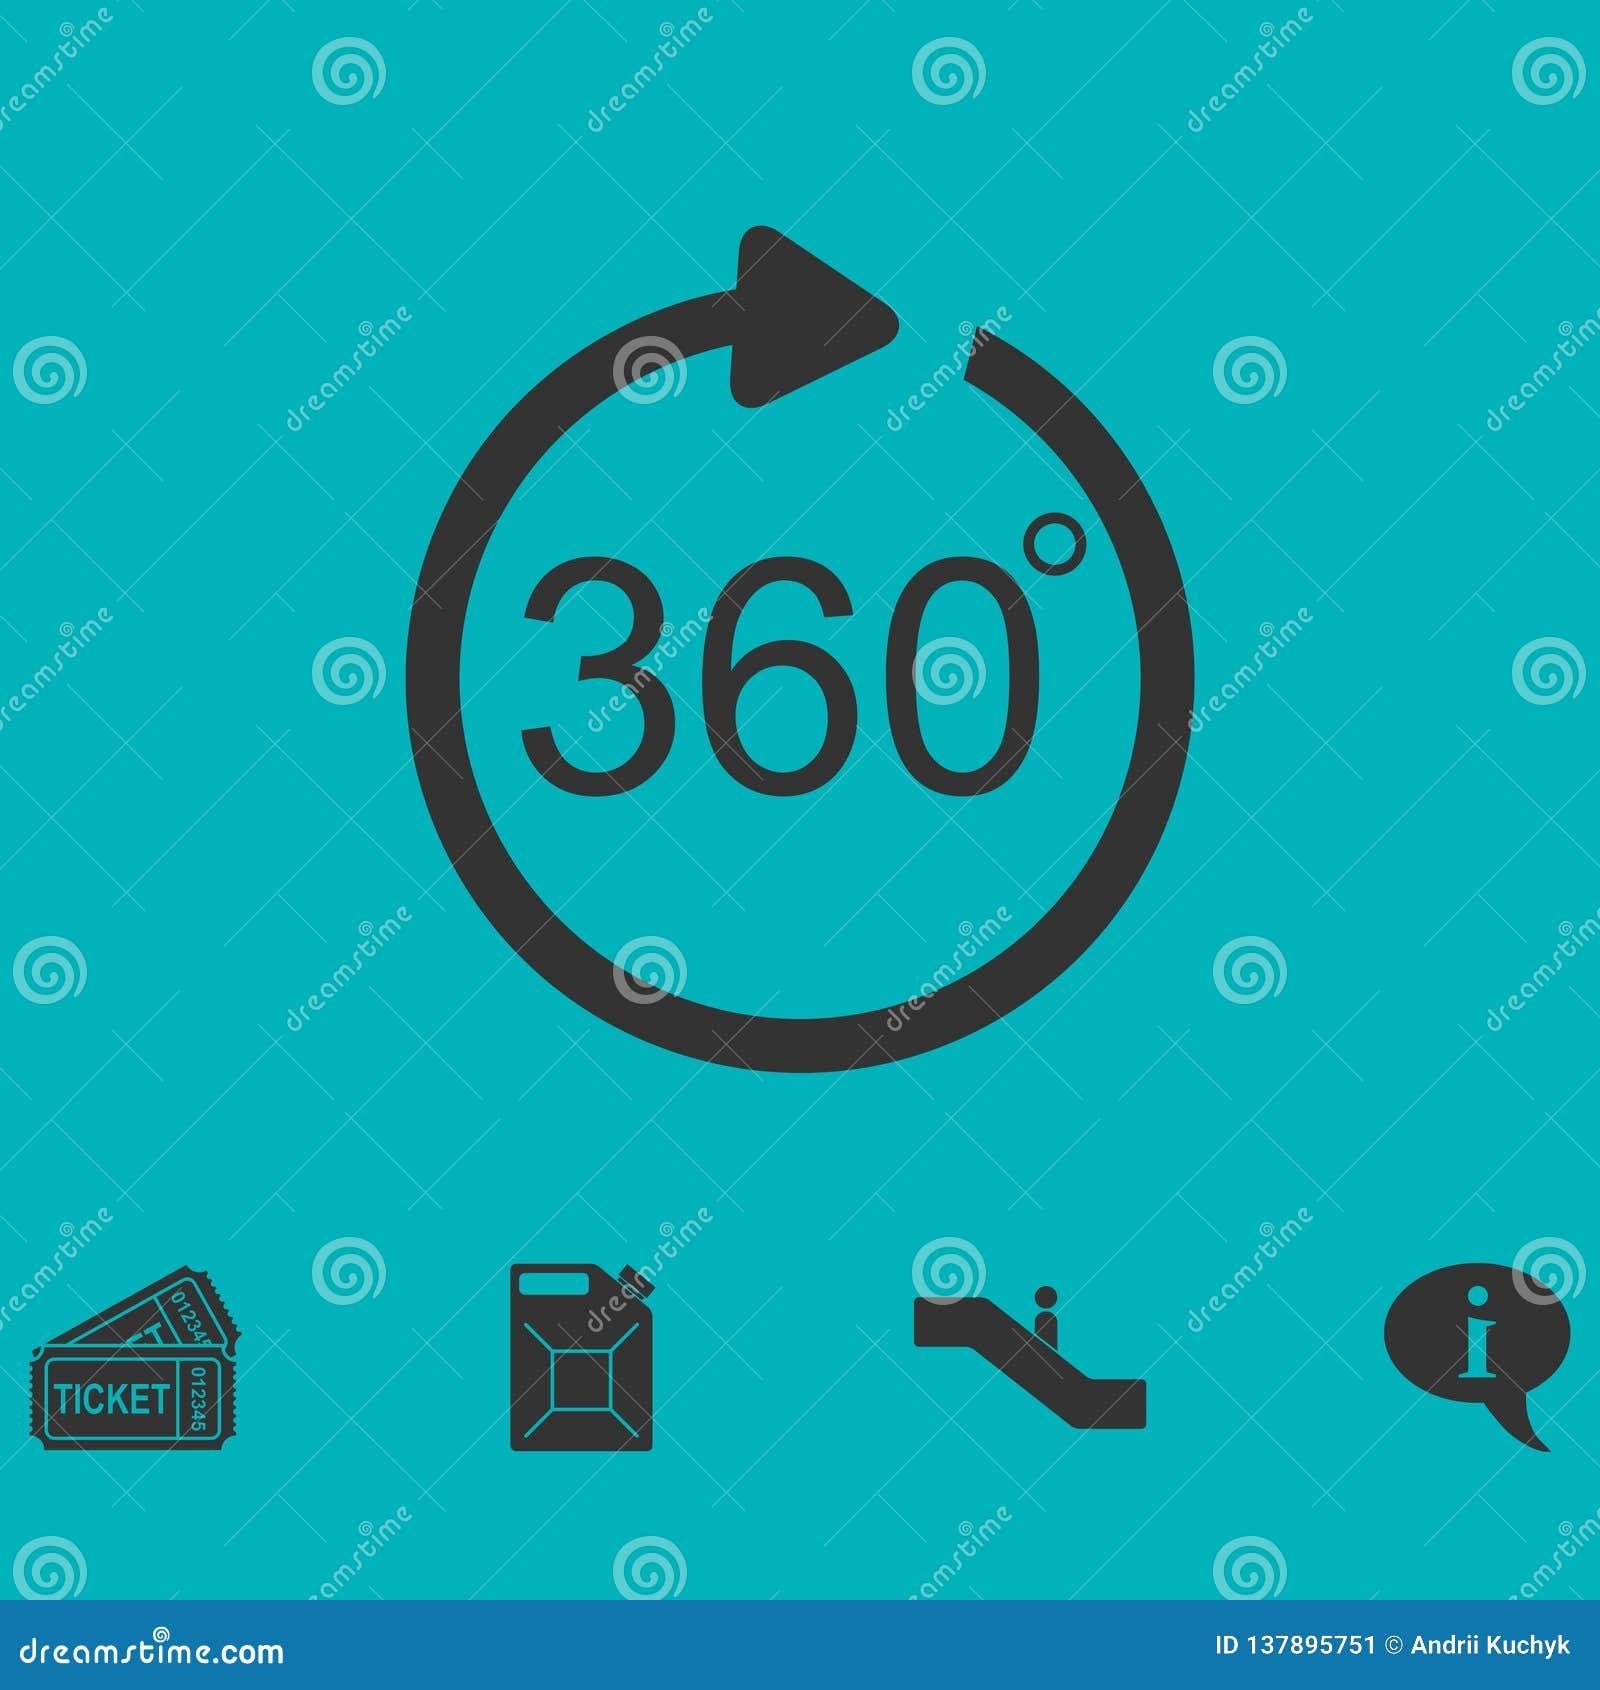 Angle 360 degrees icon flat